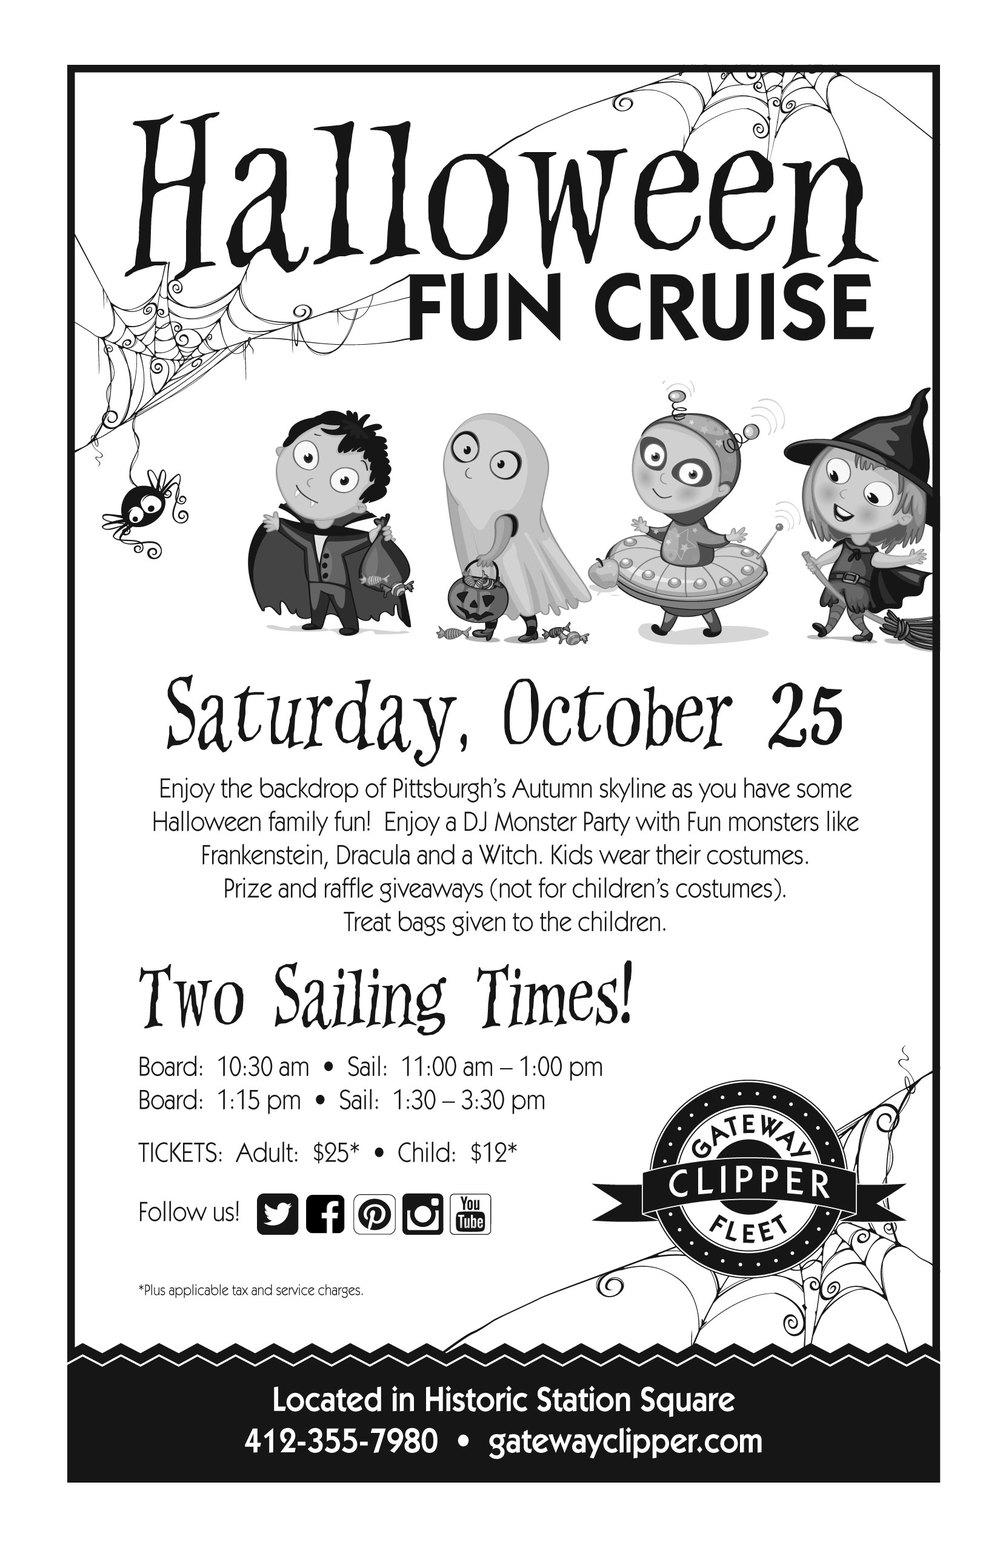 Fun piece for a Kids' Halloween Cruise